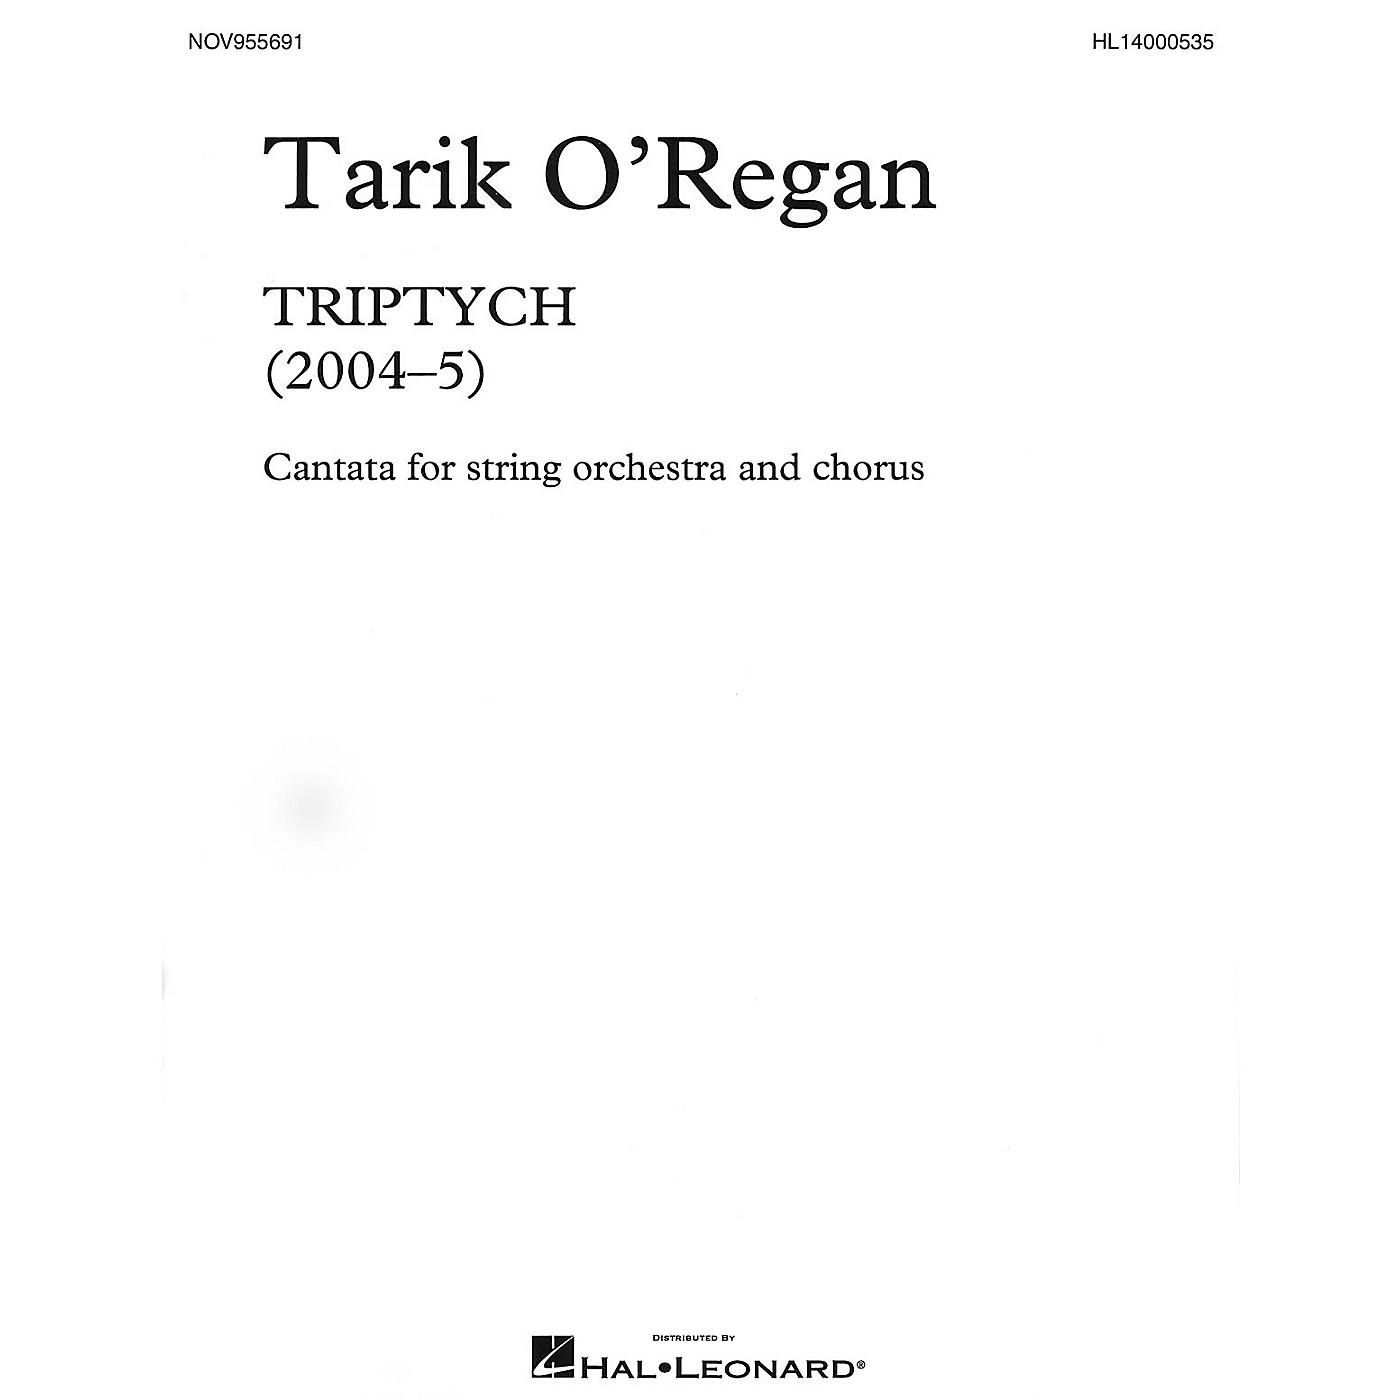 Novello Triptych (Cantata for string orchestra and chorus Vocal Score) SATB Composed by Tarik O'Regan thumbnail